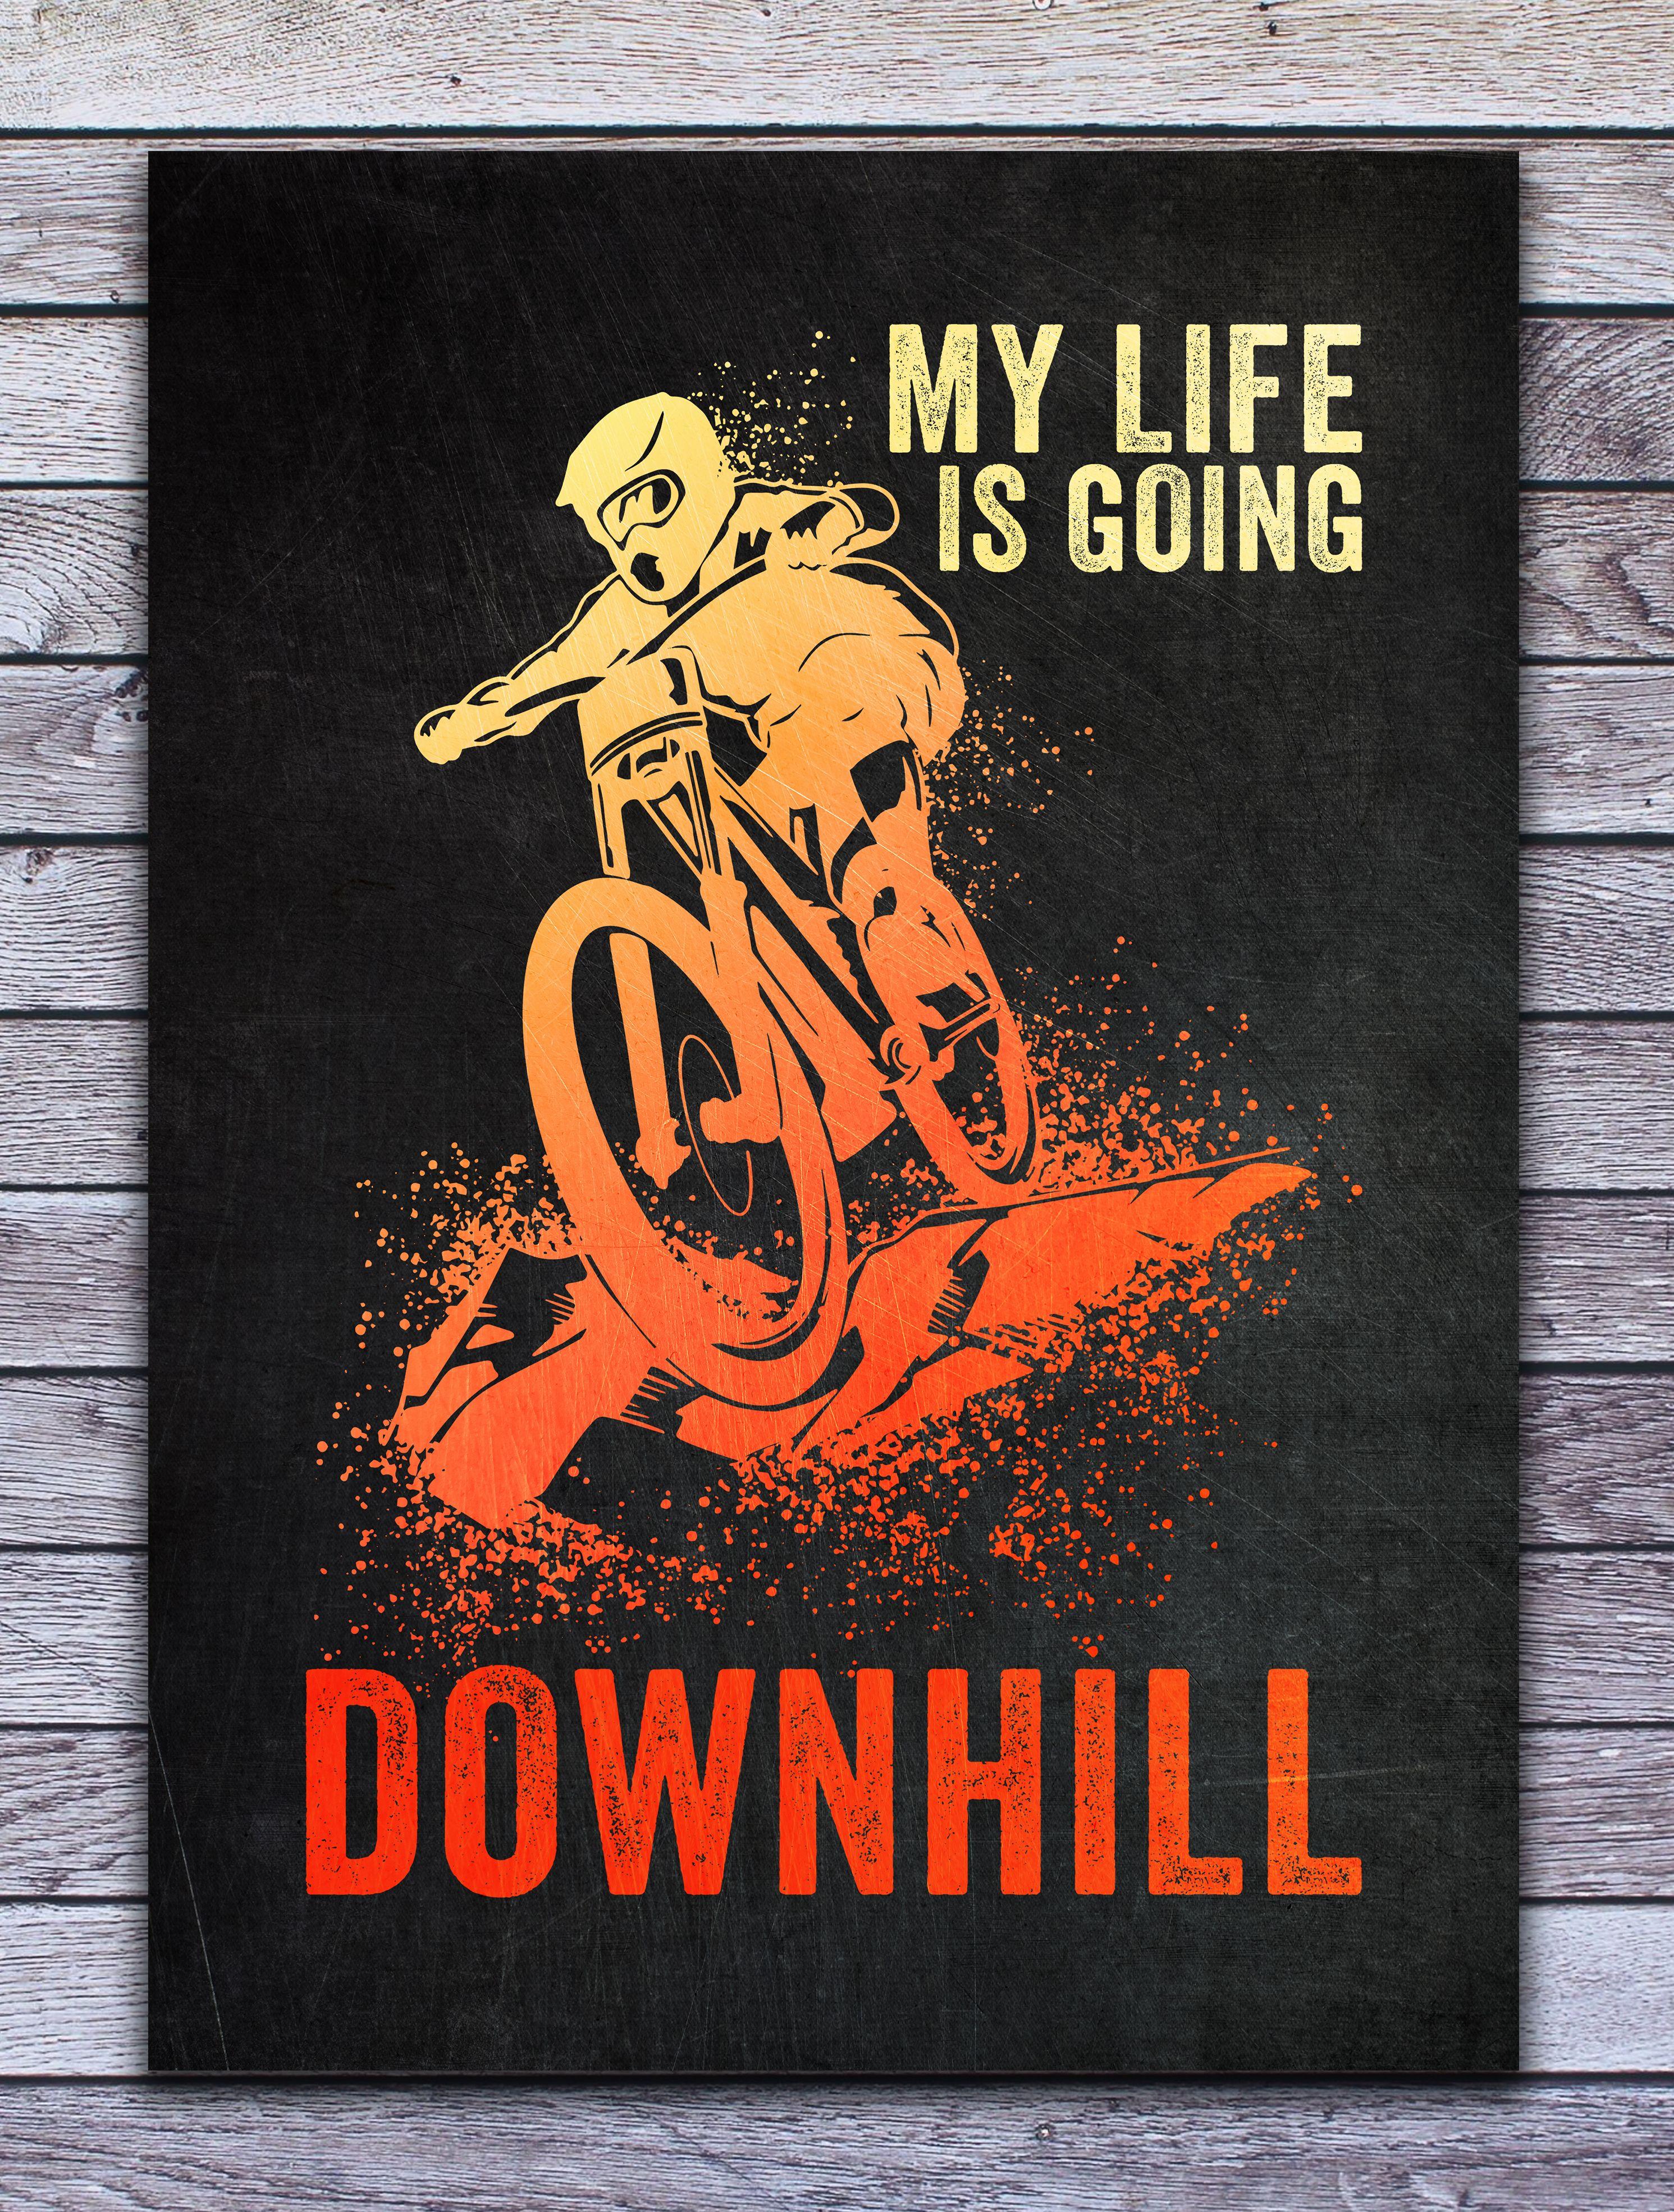 downhill biker poster by posterworld